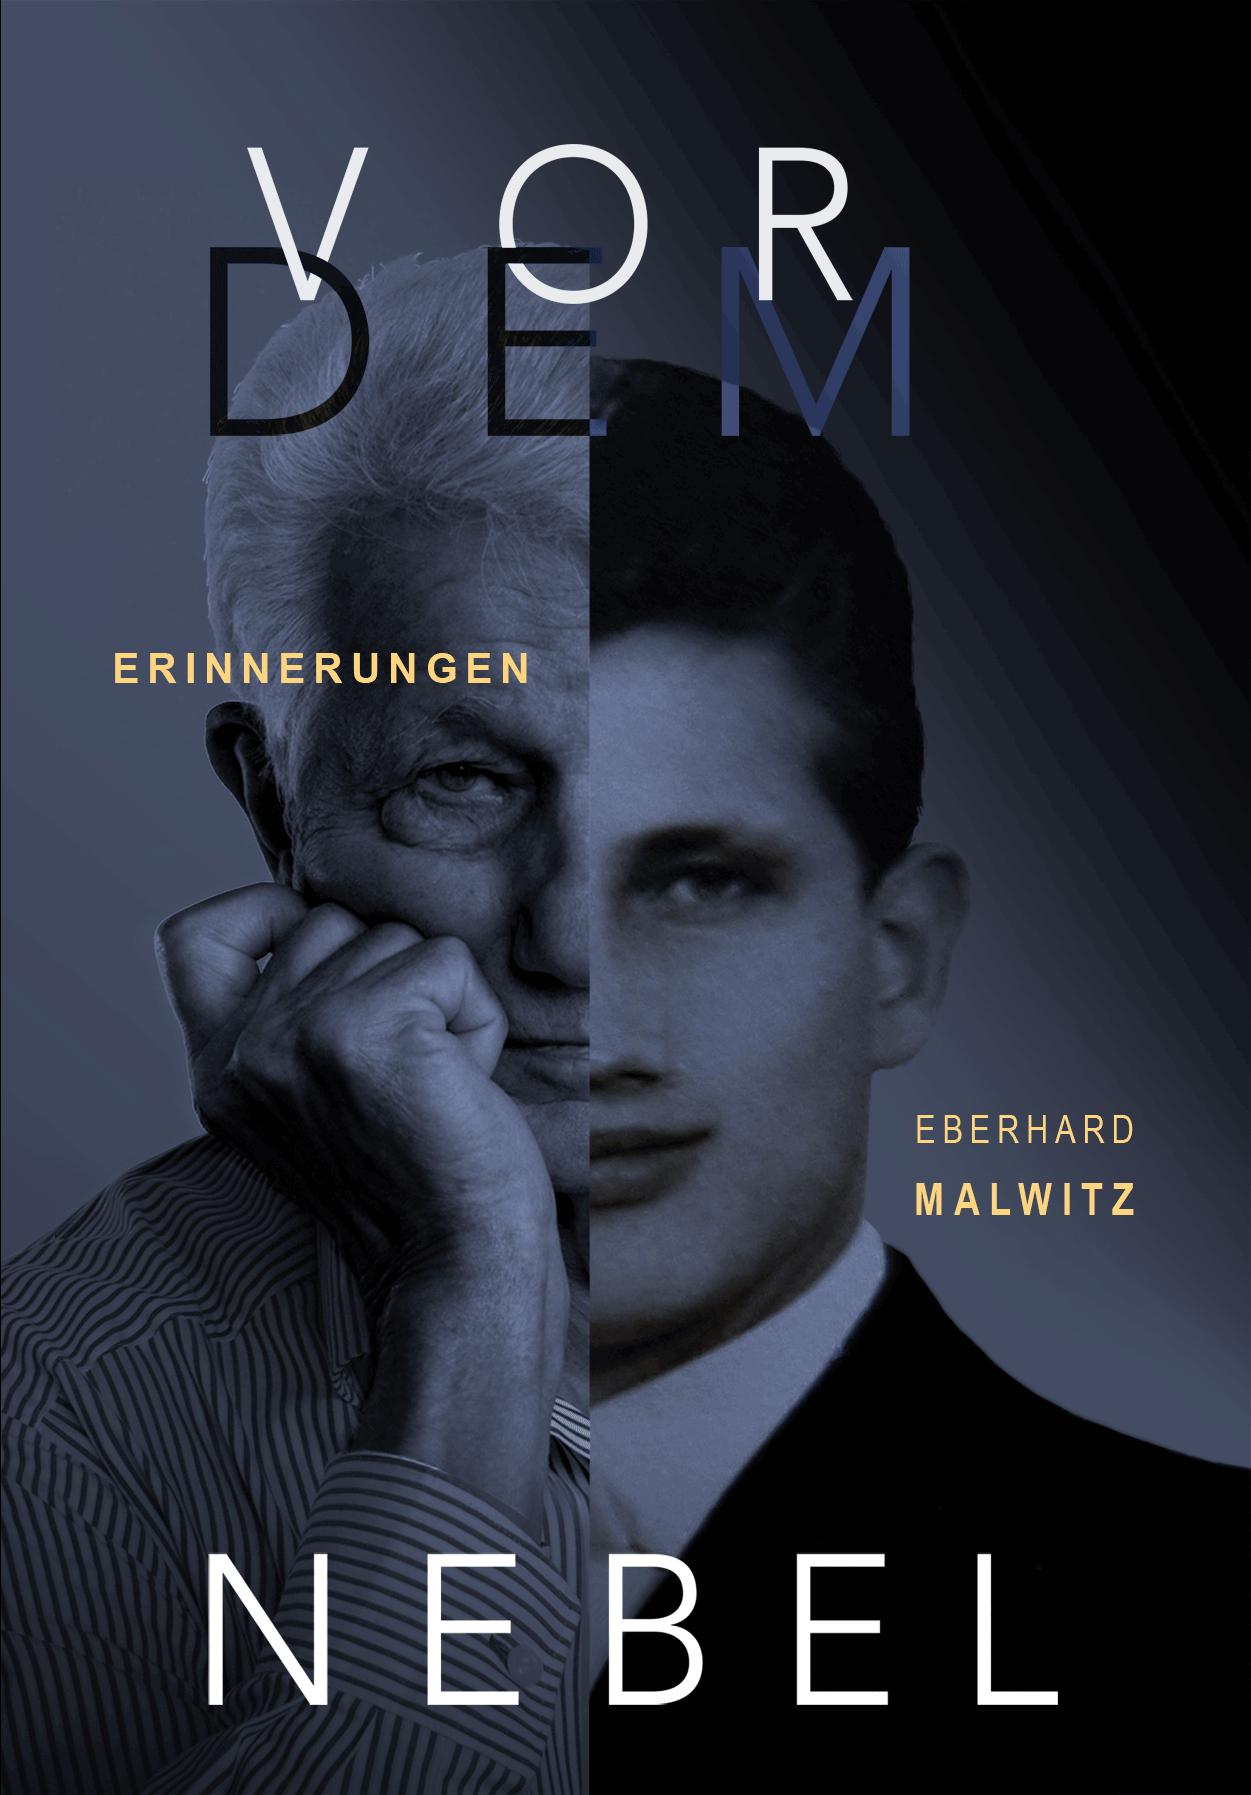 Cover designed by Karin Malwitz